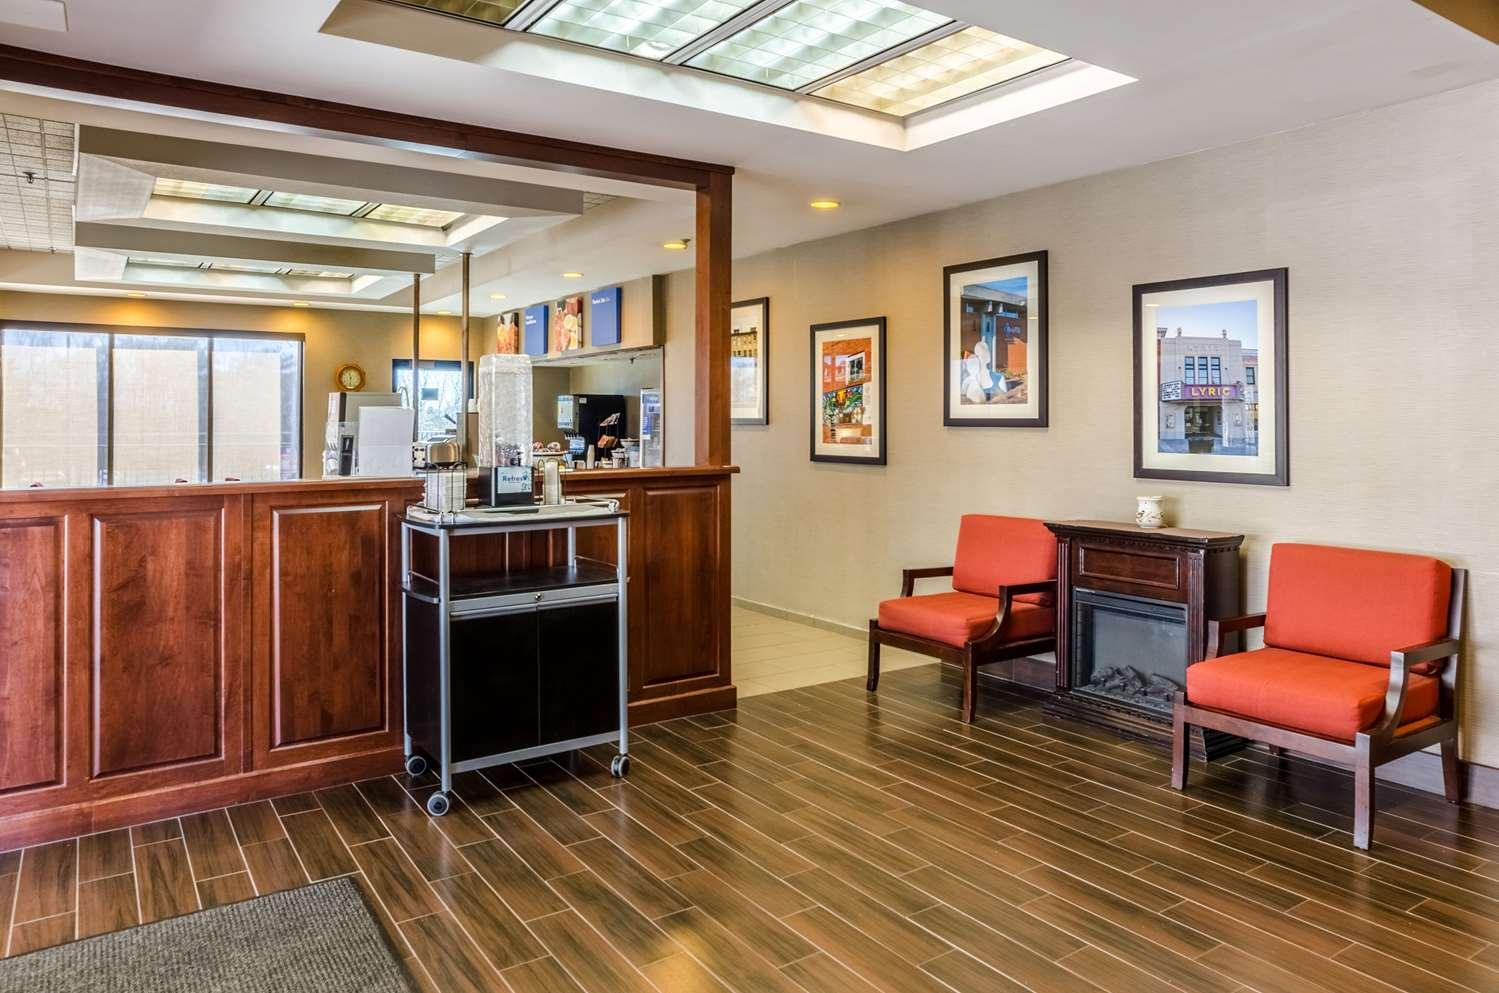 Comfort Inn Blacksburg, VA - See Discounts